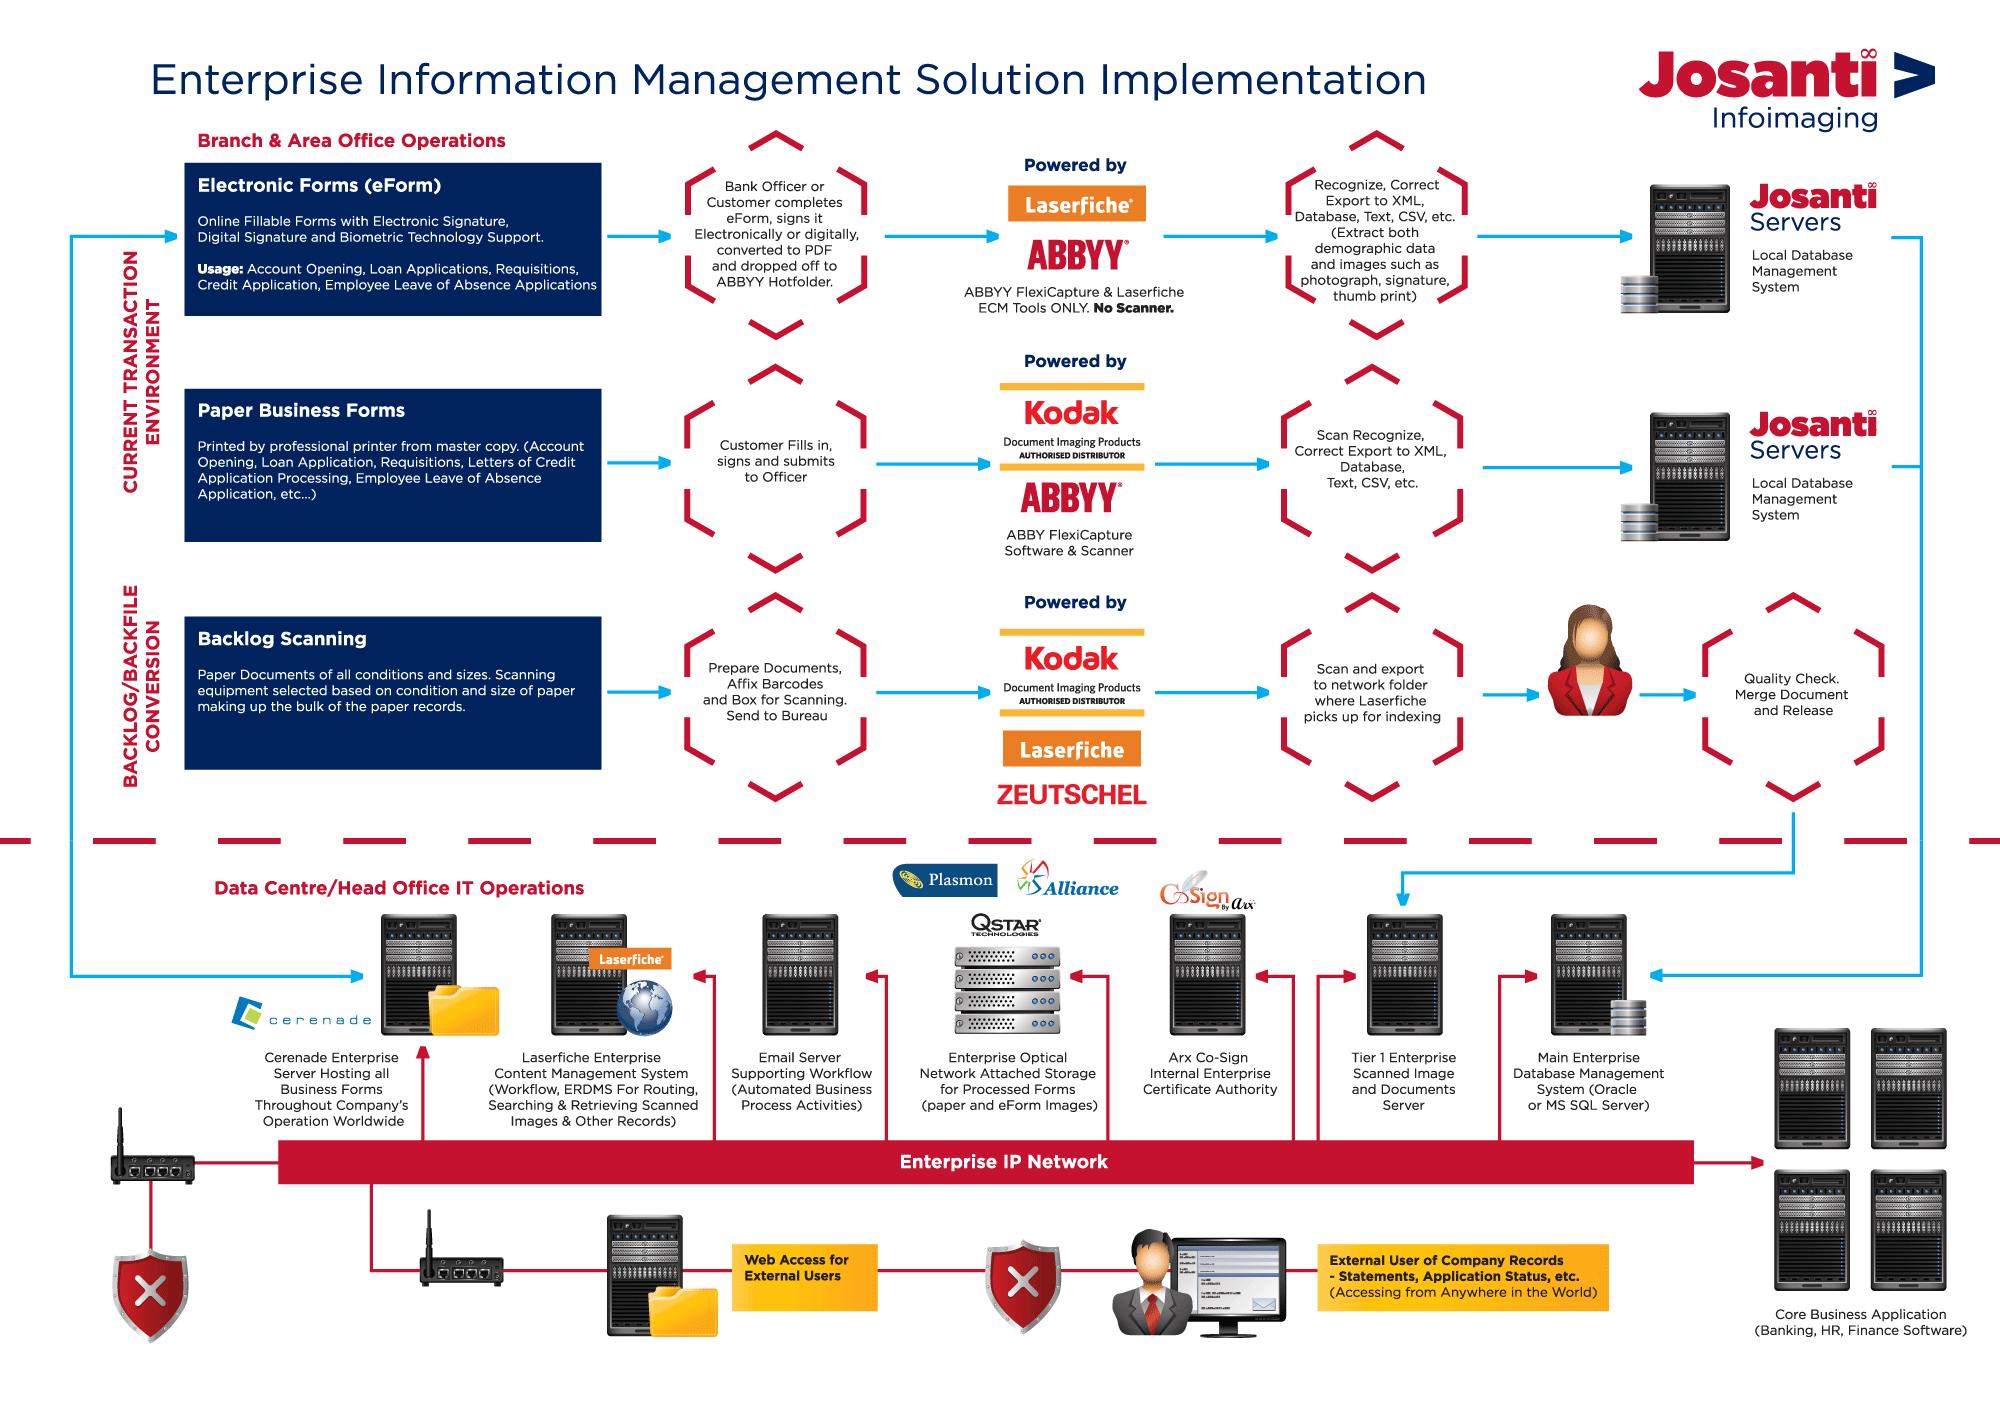 Enterprise Information Management Solutions Division